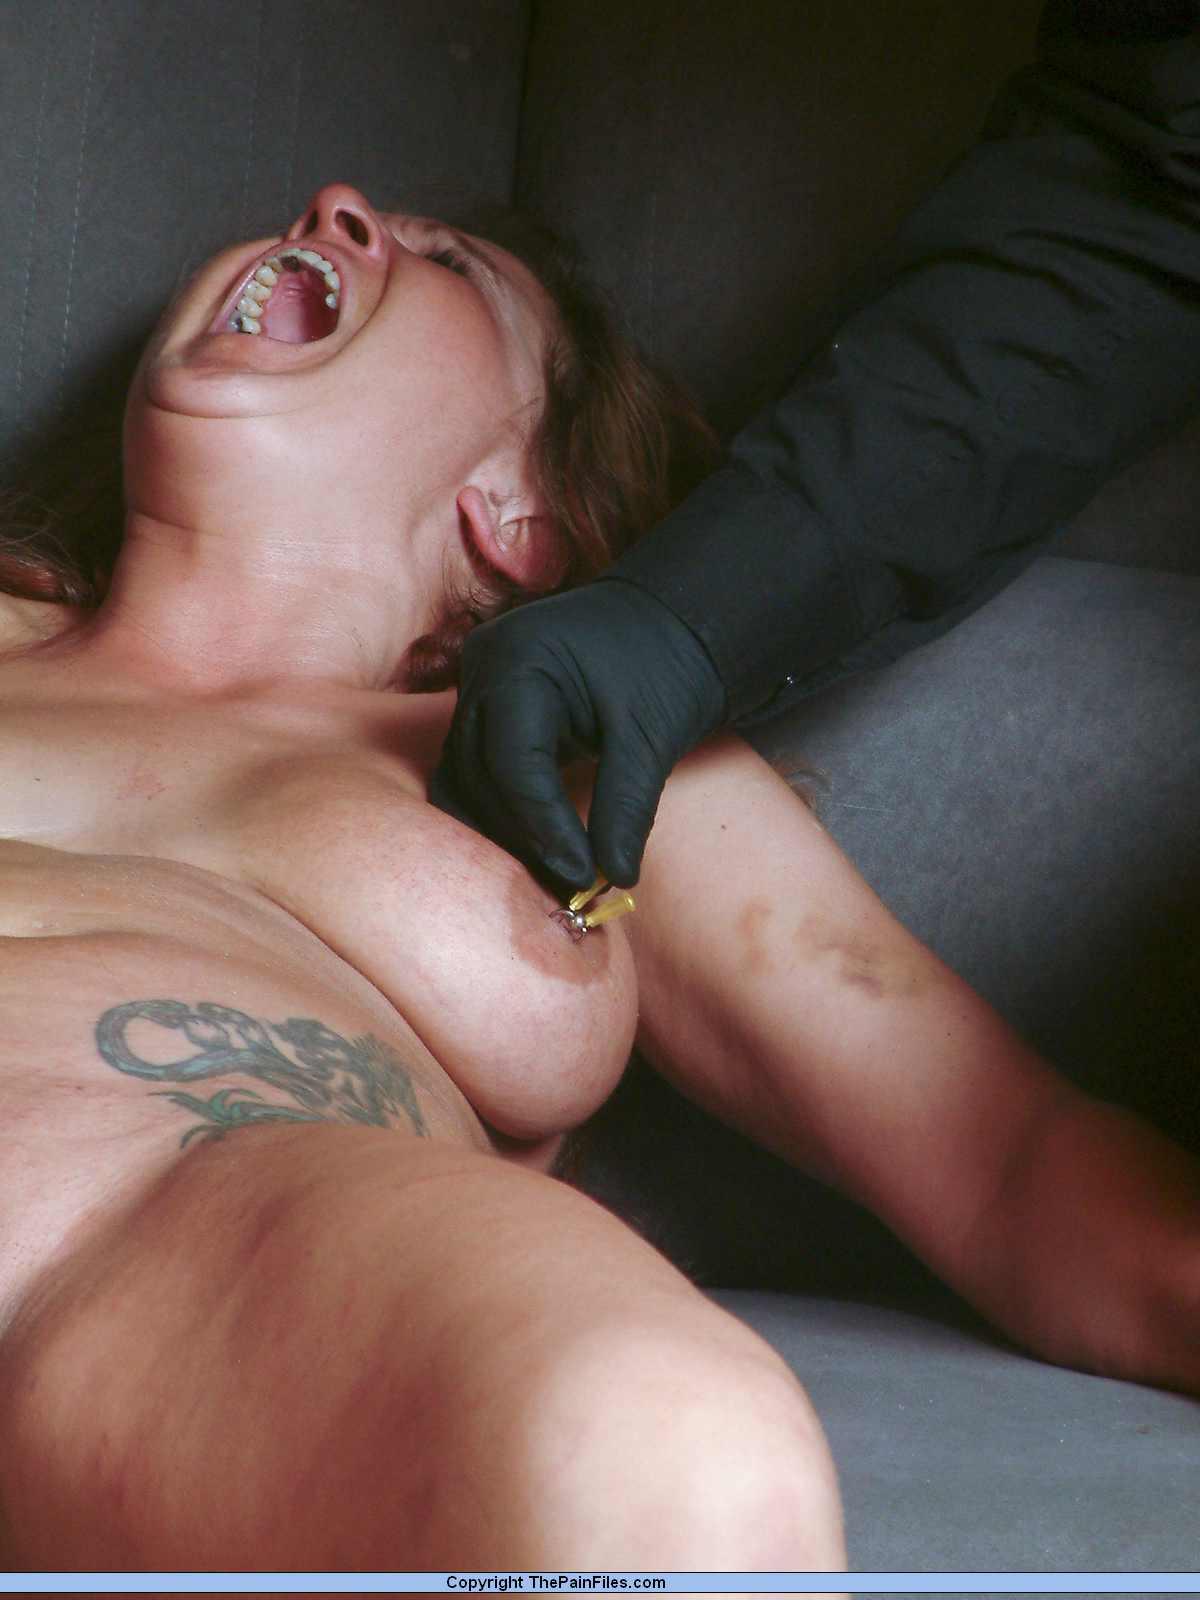 Big fat tits boobs ass booty